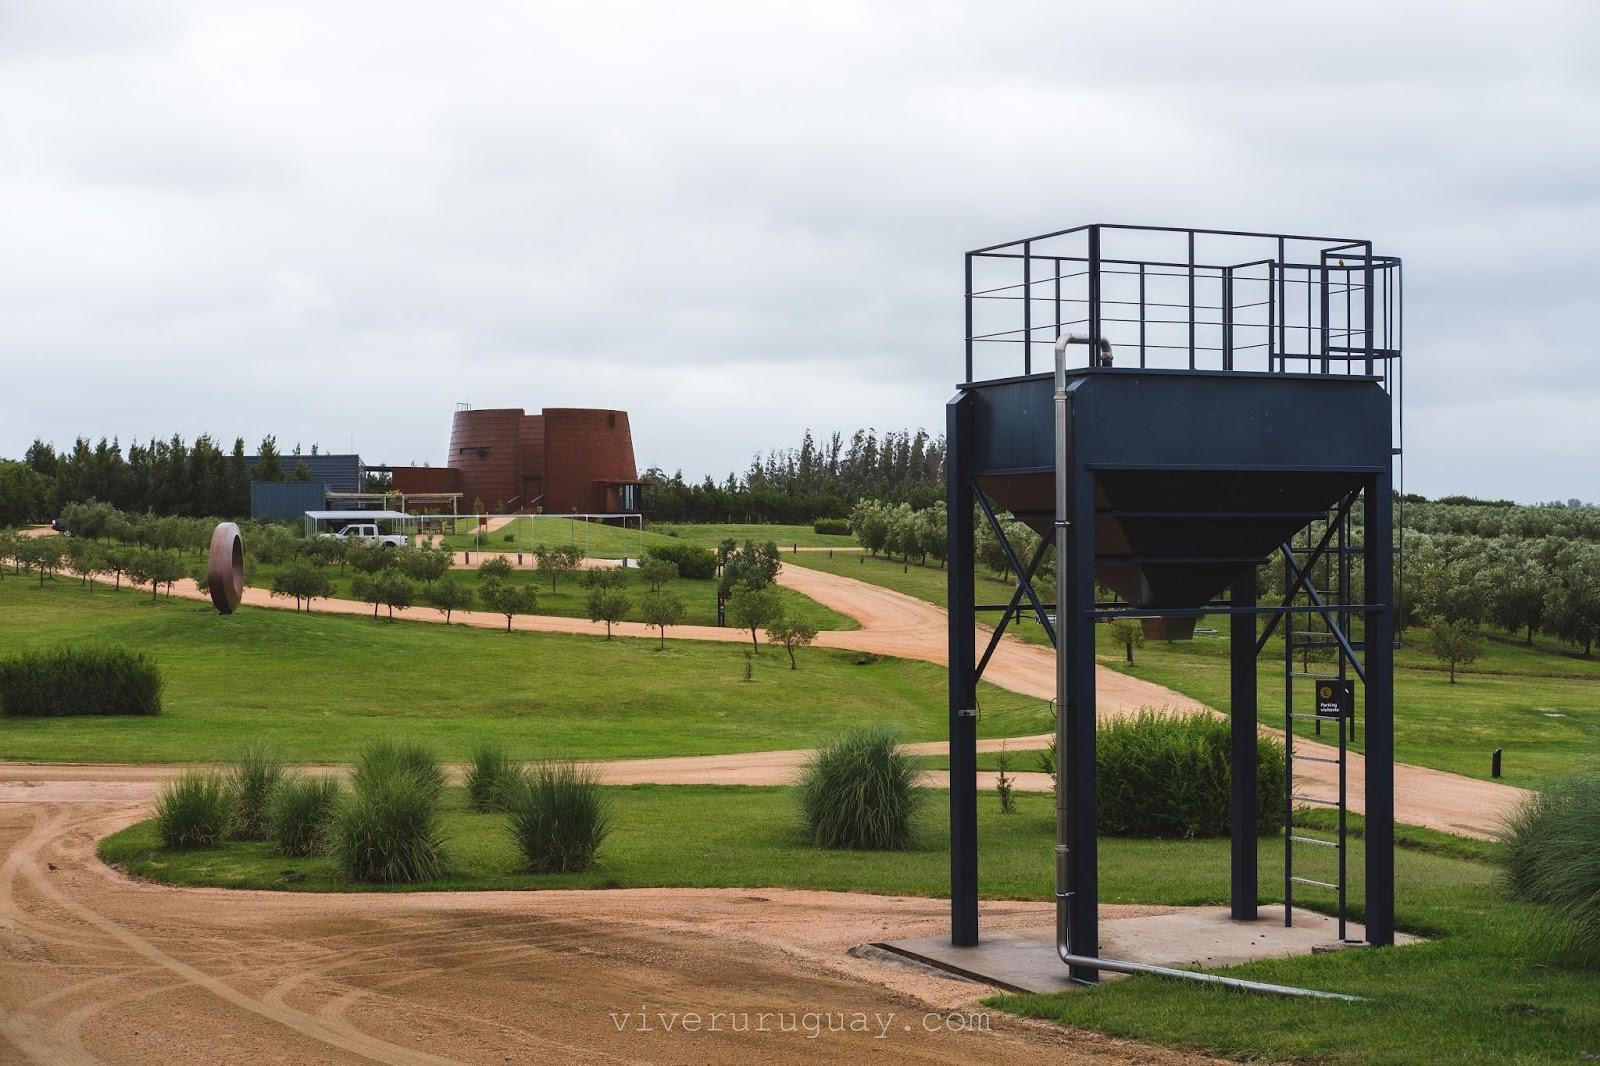 Visita fabrica azeite de oliva no Uruguai